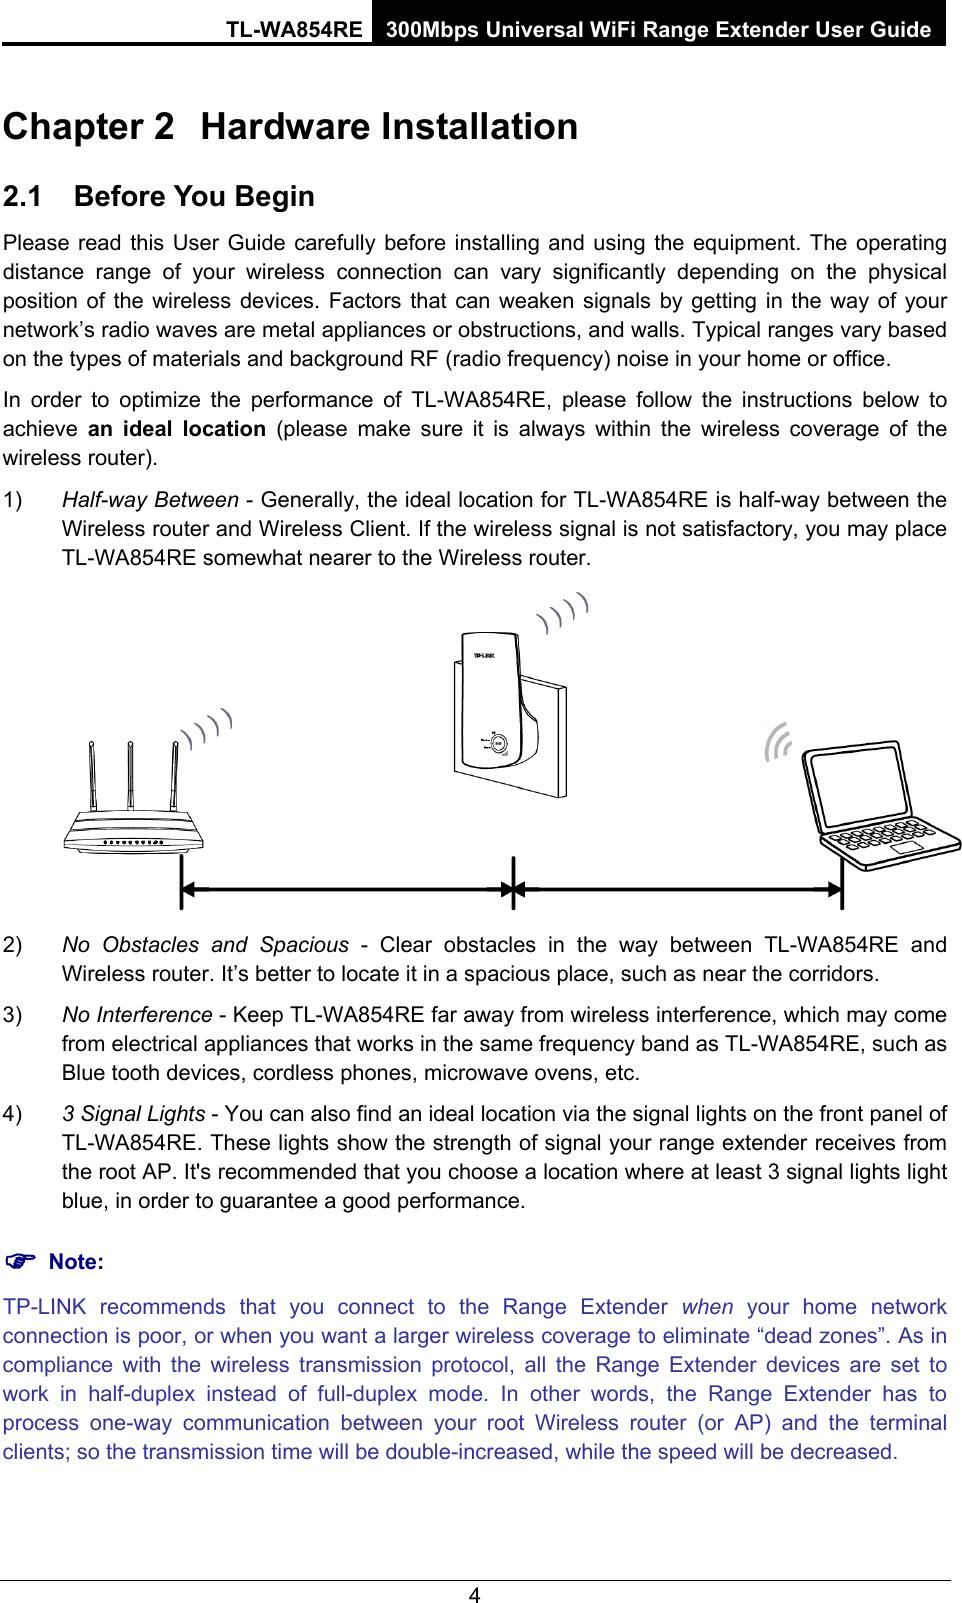 Tp Link Tl Wa854Re Users Manual